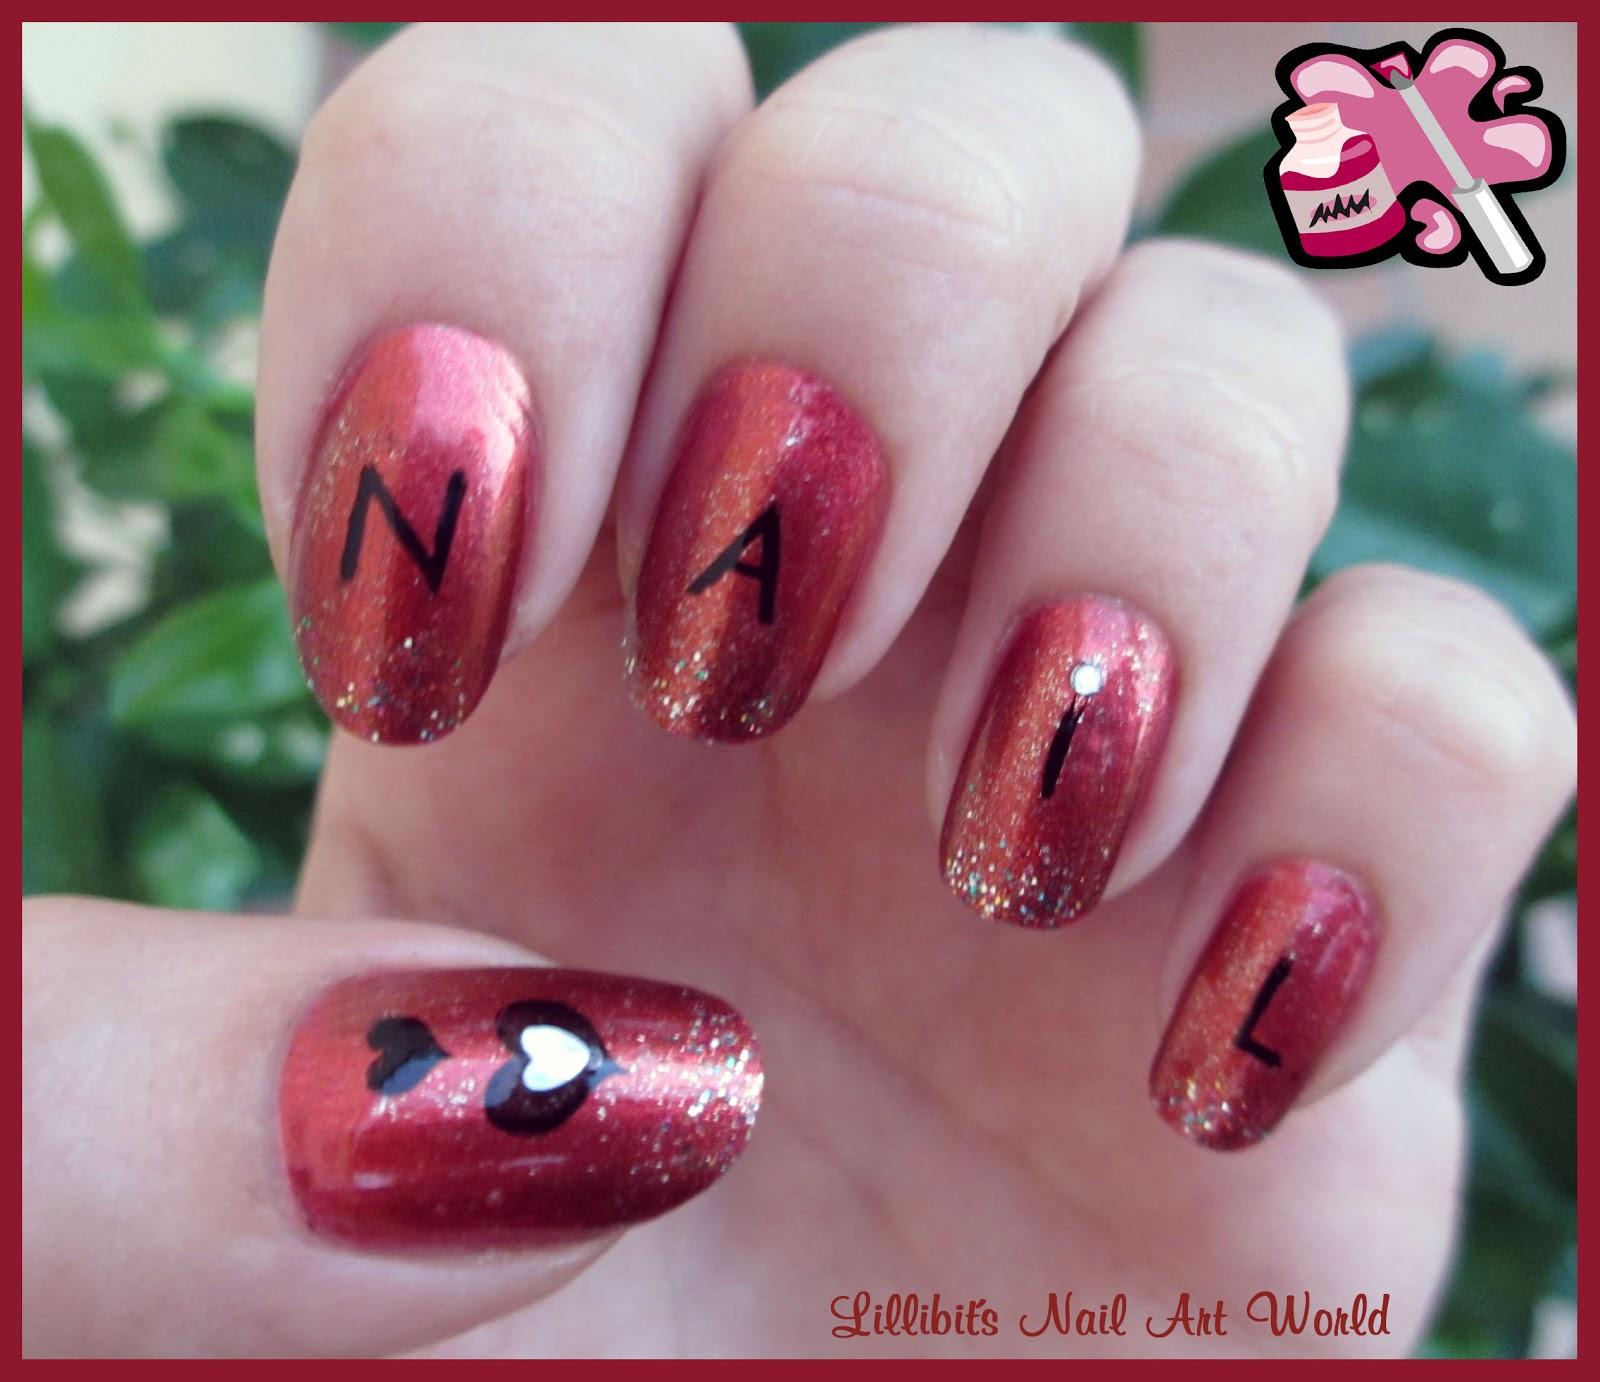 Love Nail Art: Lillibit´s Nail Art World: Love Nail Art!: Thanks, KKCenterHk